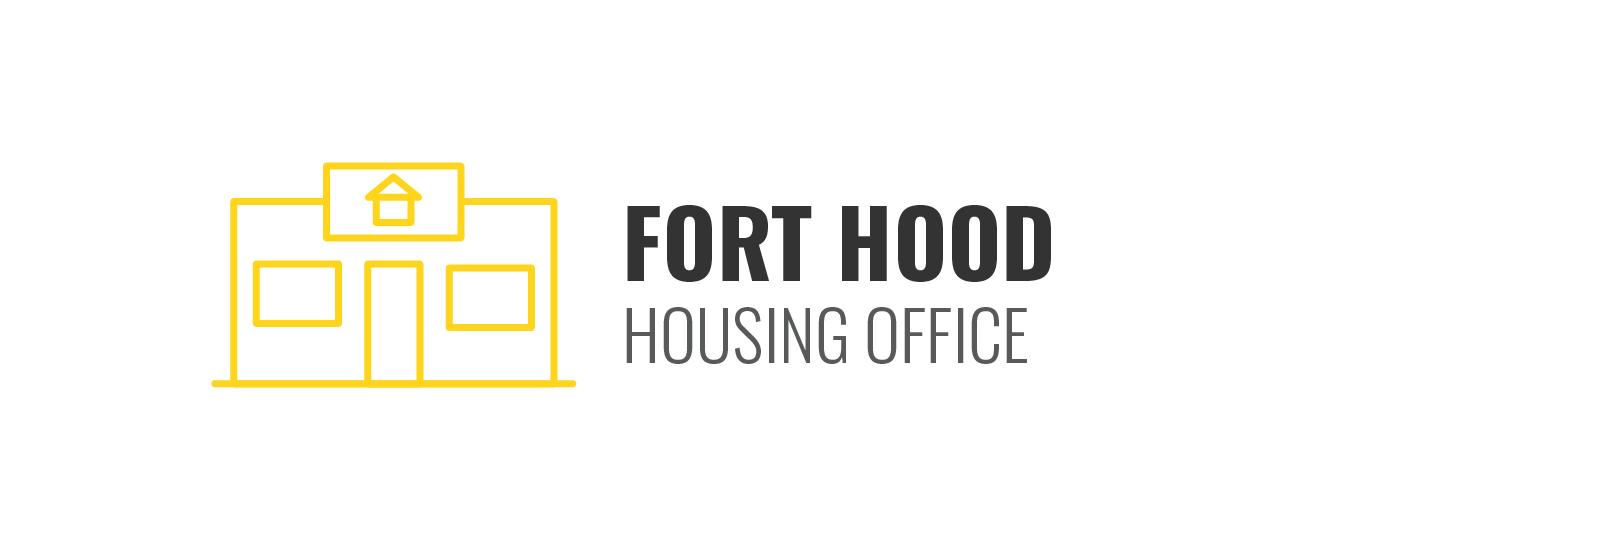 Fort Hood Housing Office